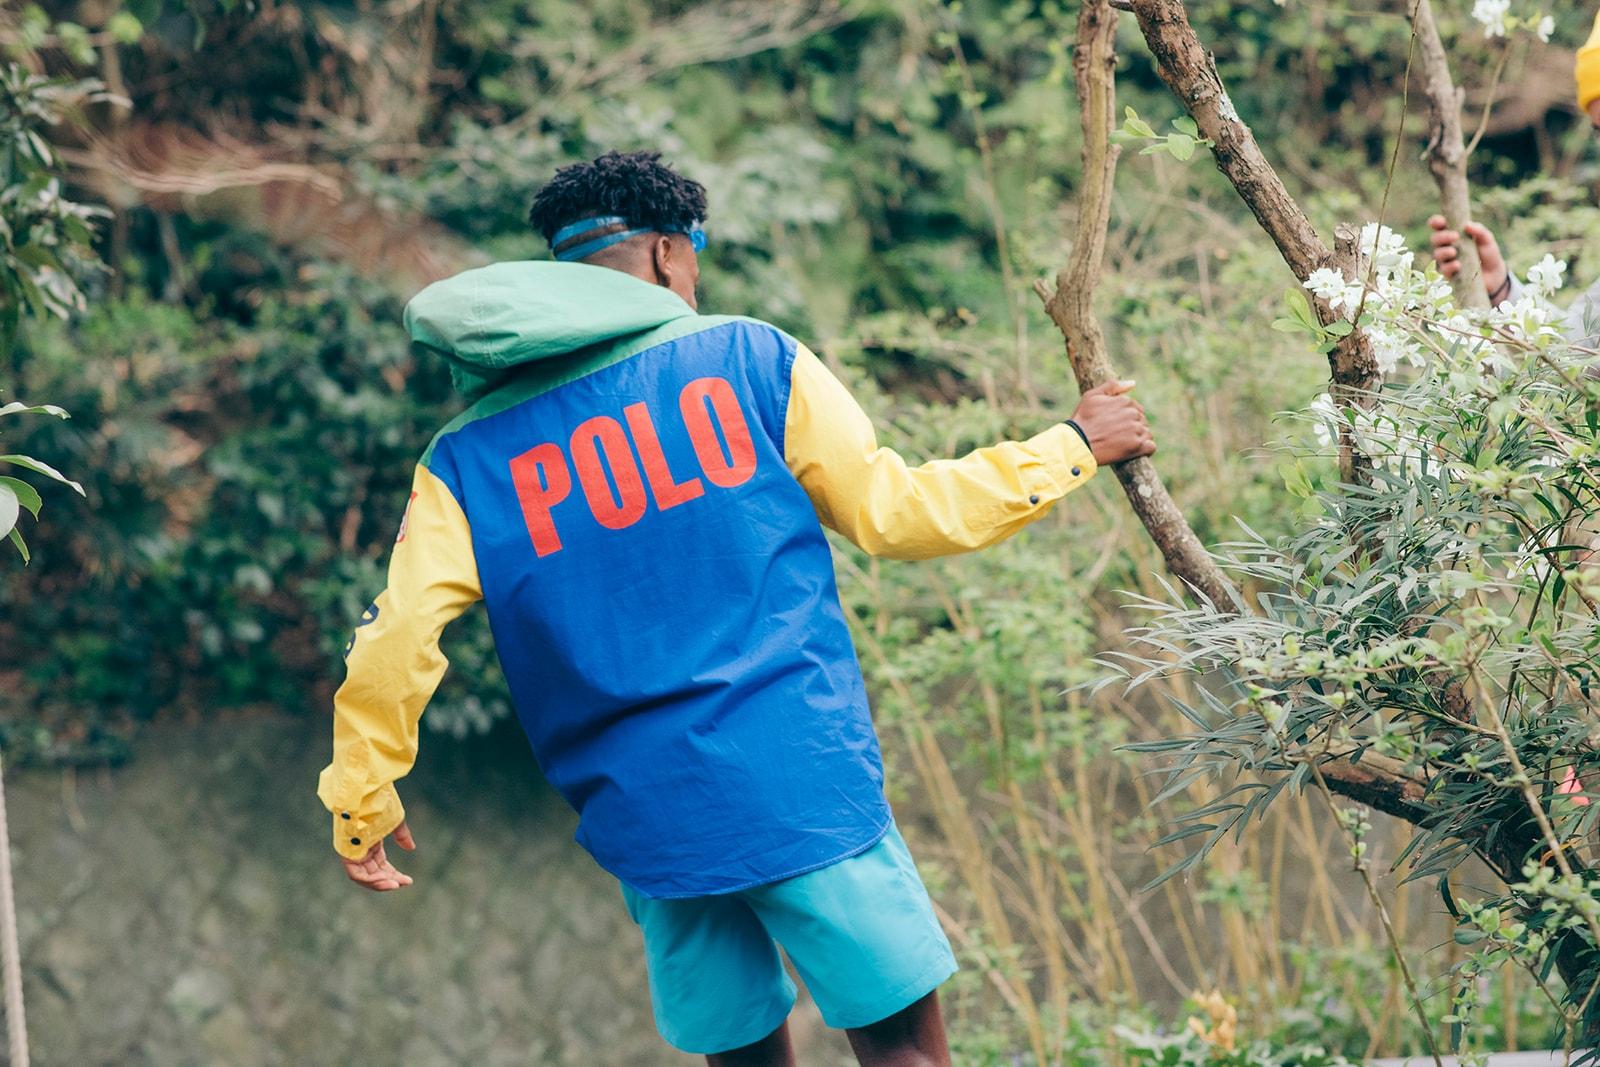 Polo Ralph Lauren ポロ ラルフ ローレン  Polo Sport ポロ スポーツ 2020年春夏コレクション ショートムービー 動画 映像 ルックブック ハイプビースト